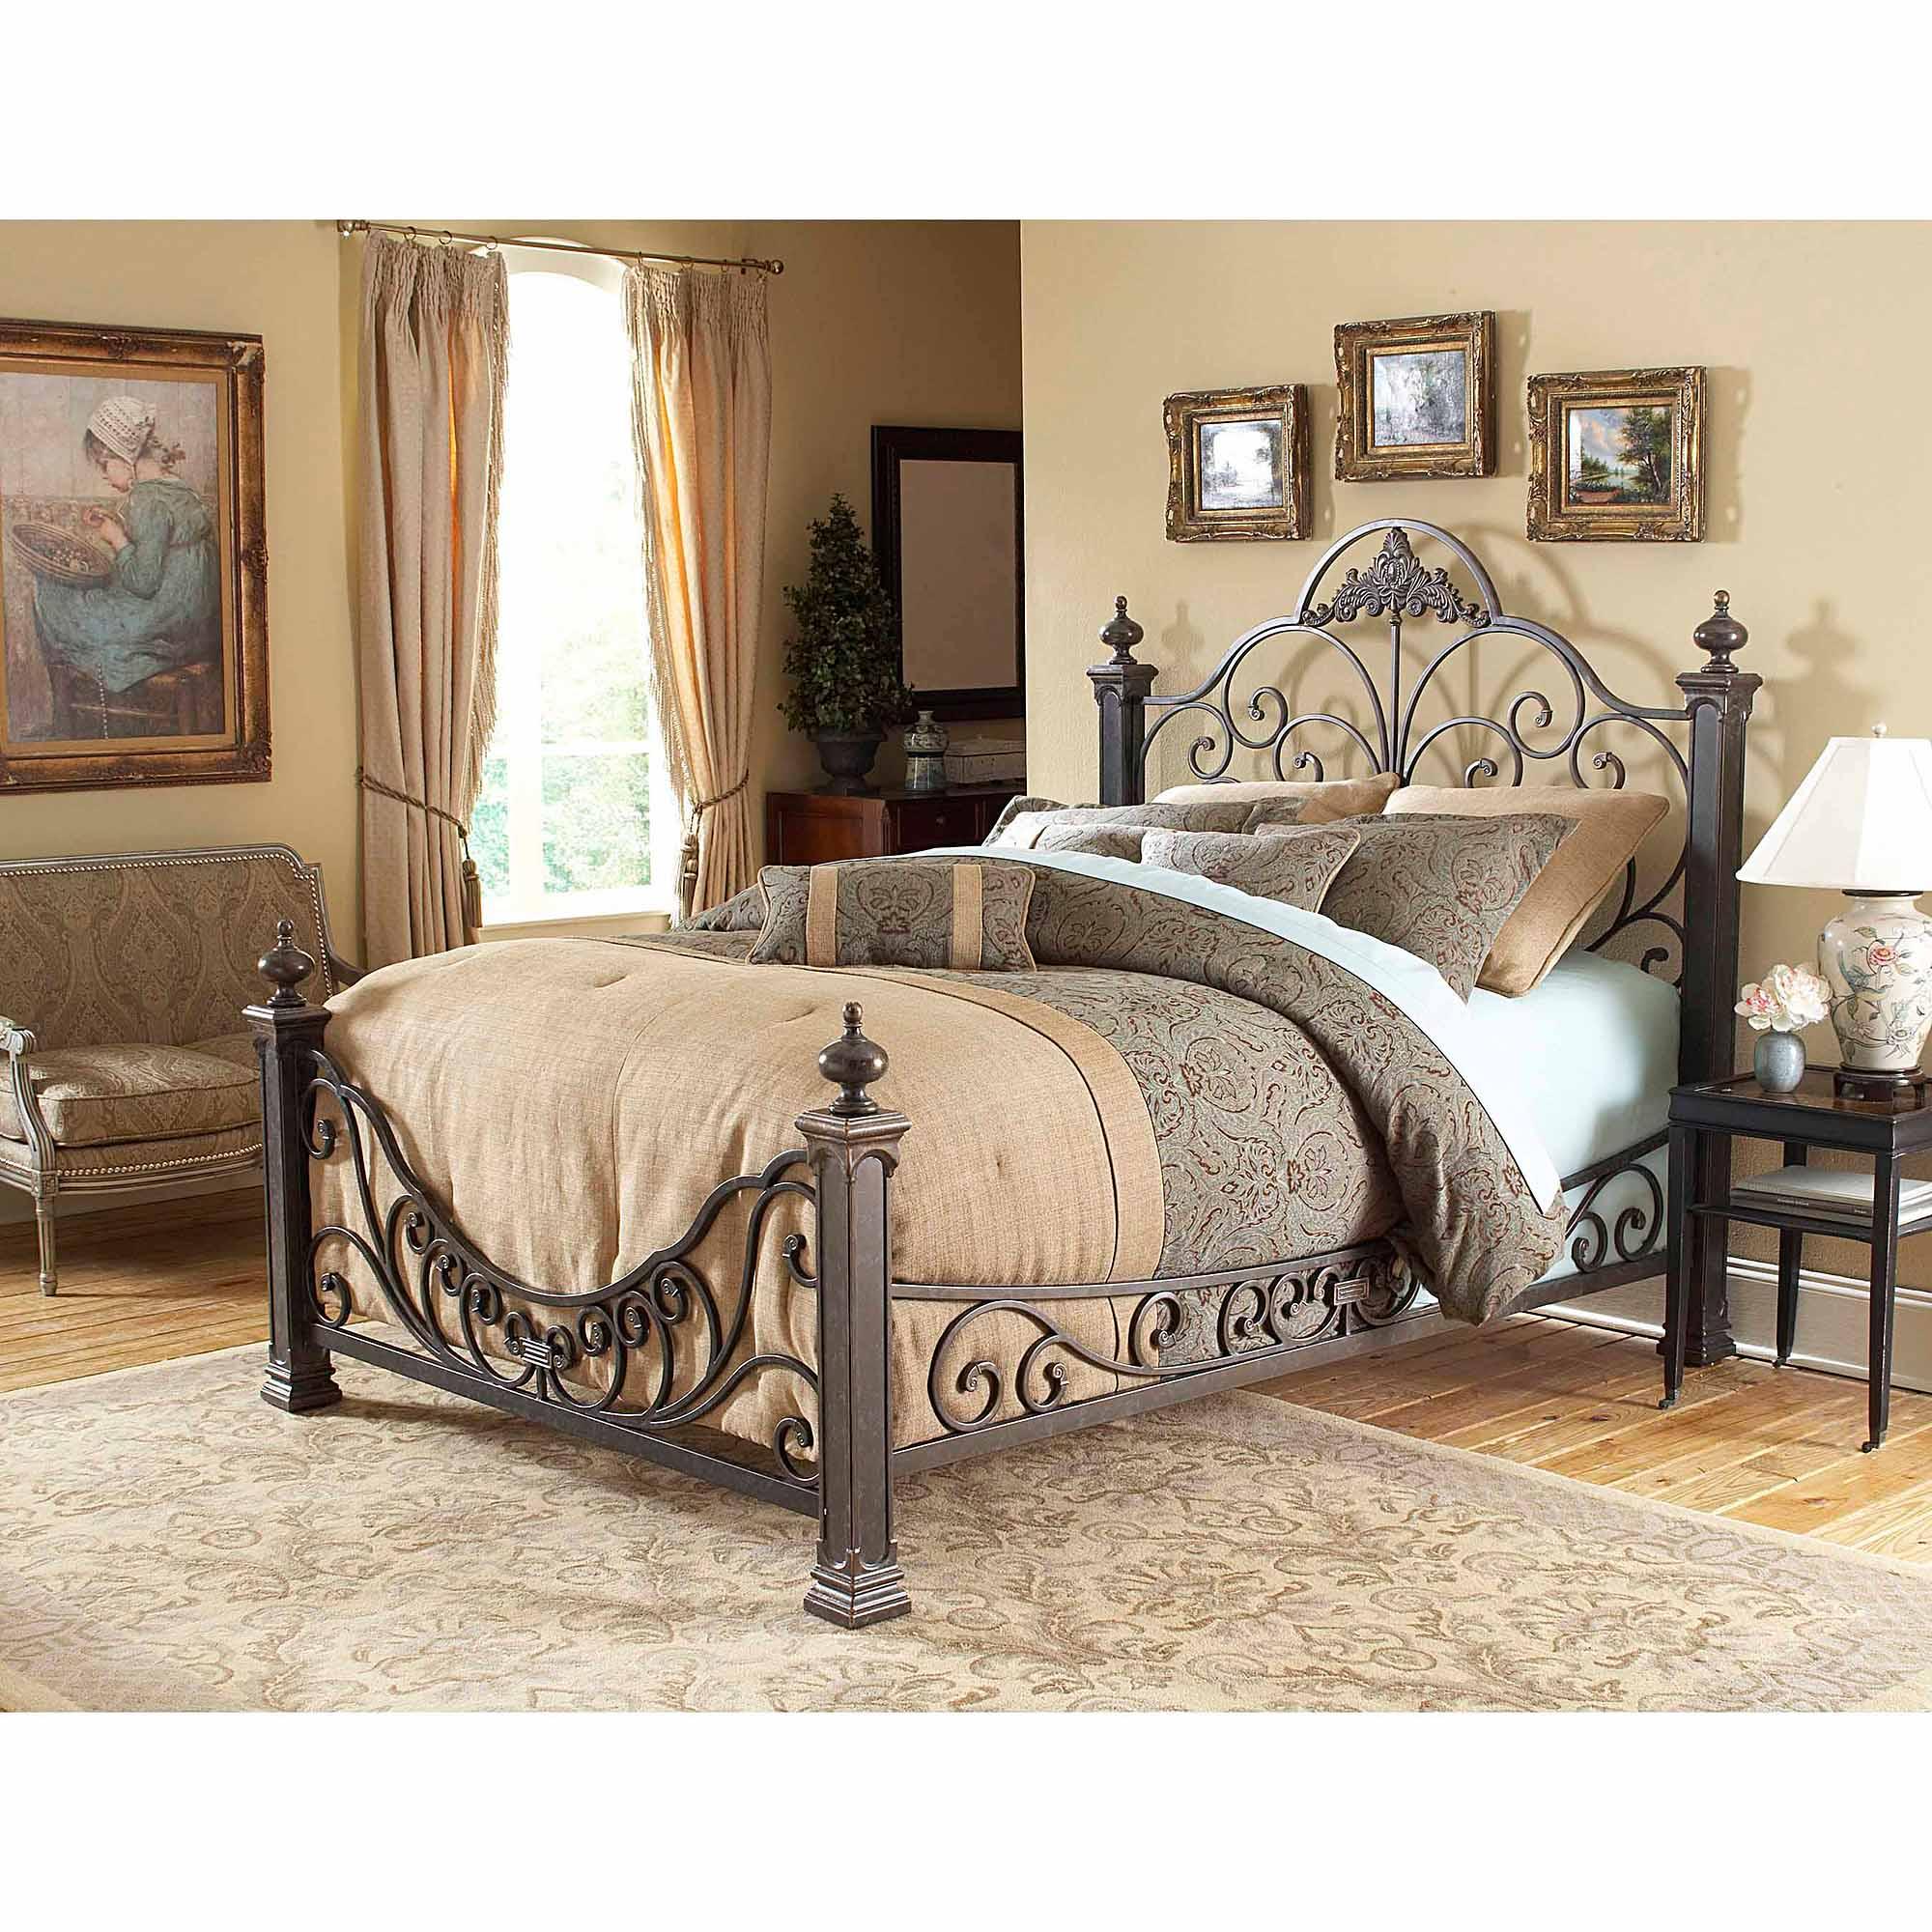 Leggett & Platt Fashion Bed Group Baroque Queen Bed Side Rails and Slats, Gilded Slate (Box 3 of 3)